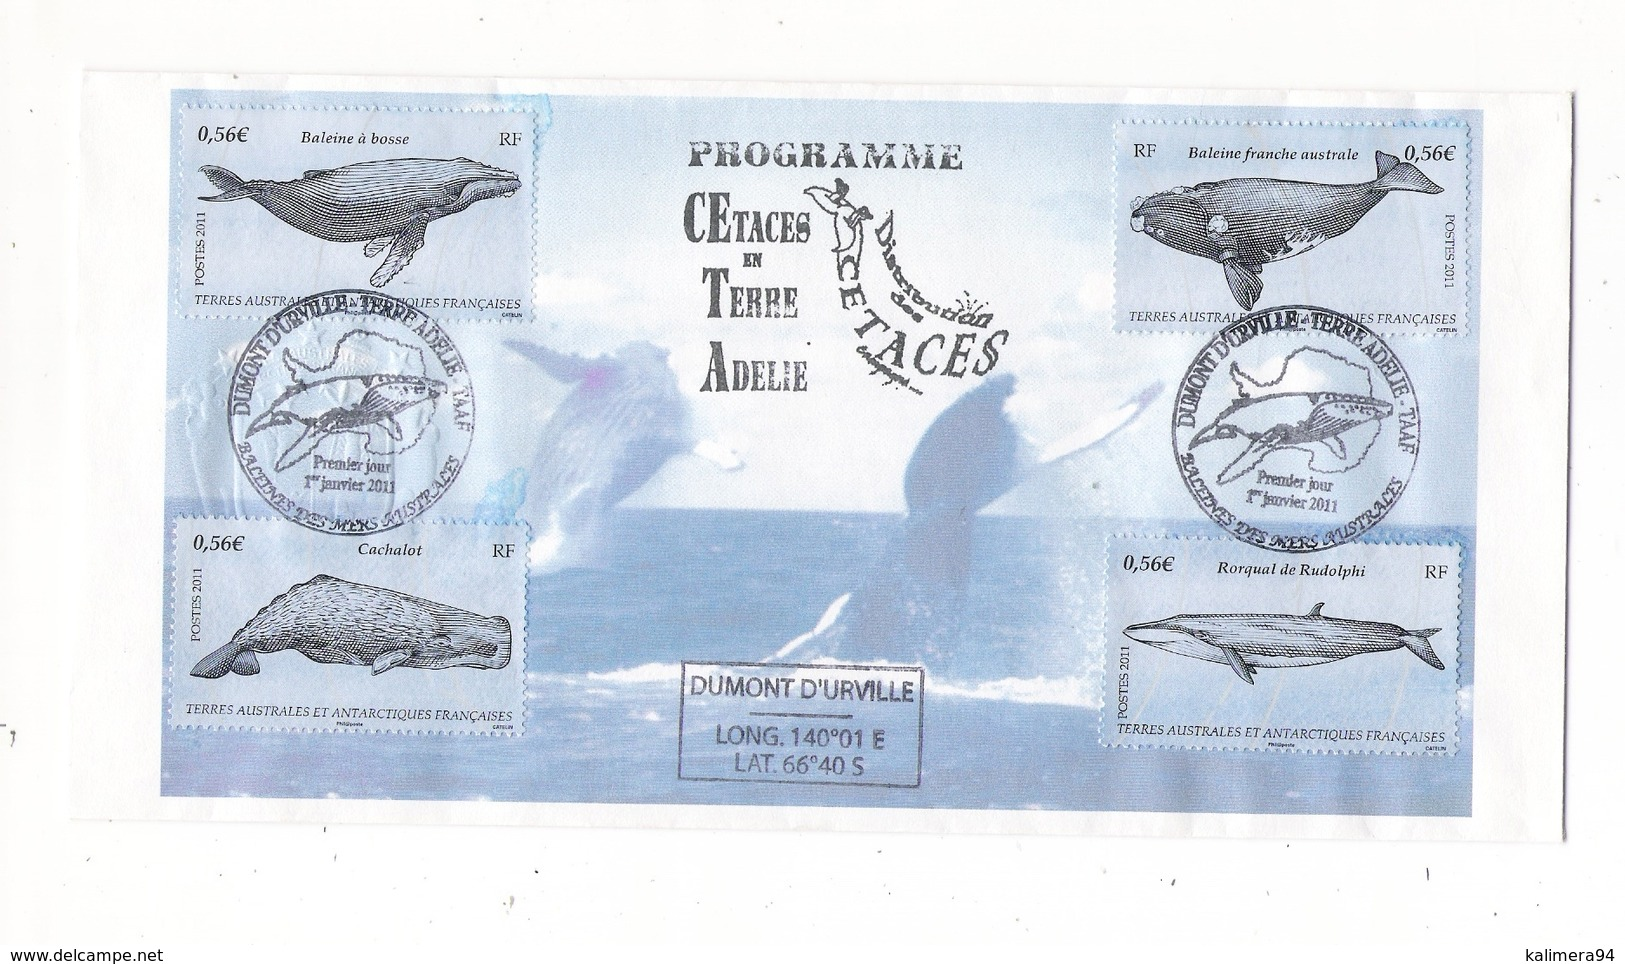 TERRES AUSTRALES ET ANTARCTIQUES FRANCAISES ( TAAF ) / Programme Cétacés ( 4 Timbres : Baleines, Cachalot, Rorqual ) - TAAF : Terres Australes Antarctiques Françaises